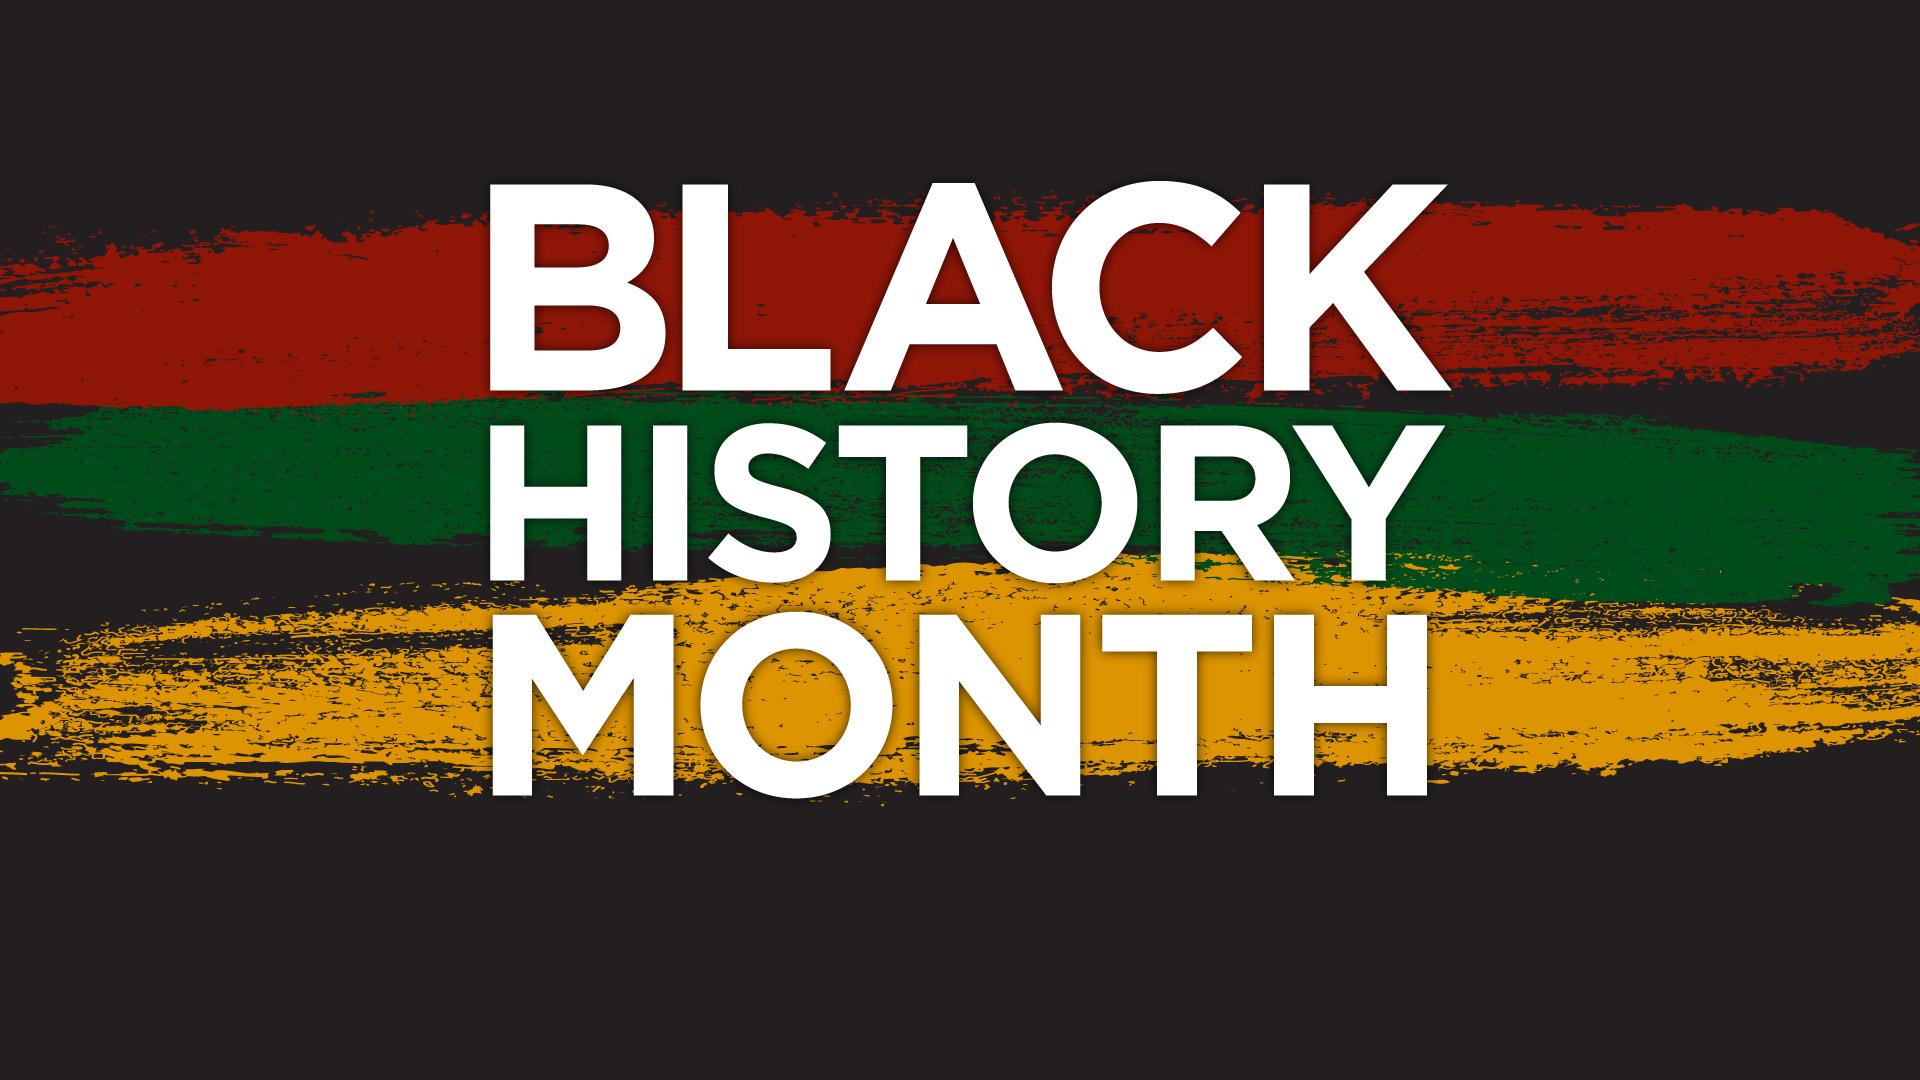 Black-History-Month-2017-Image